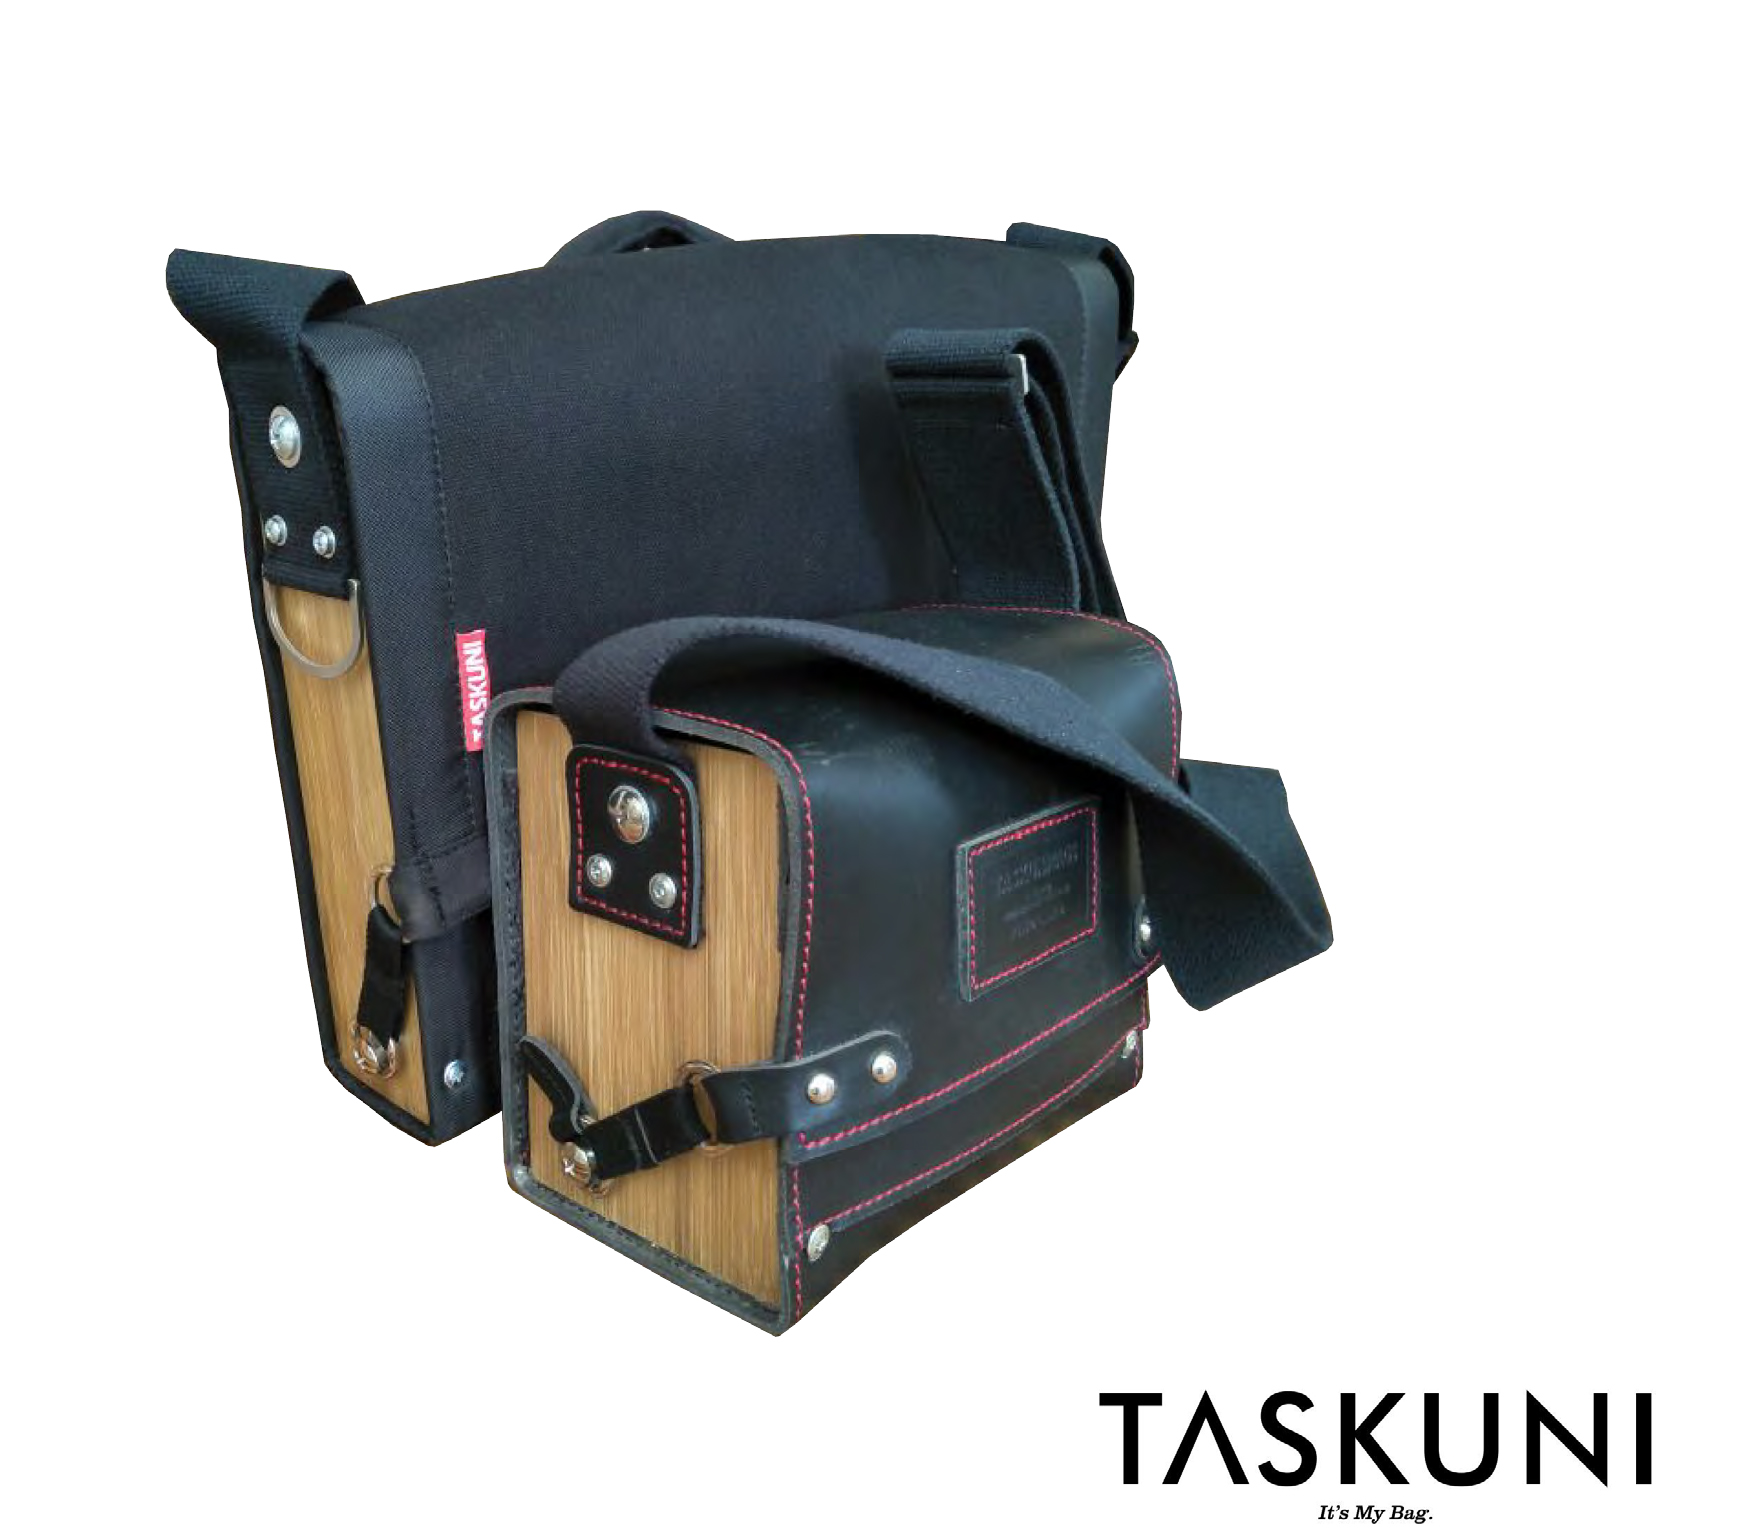 Taskuni Bags | foto : sarasvati.com